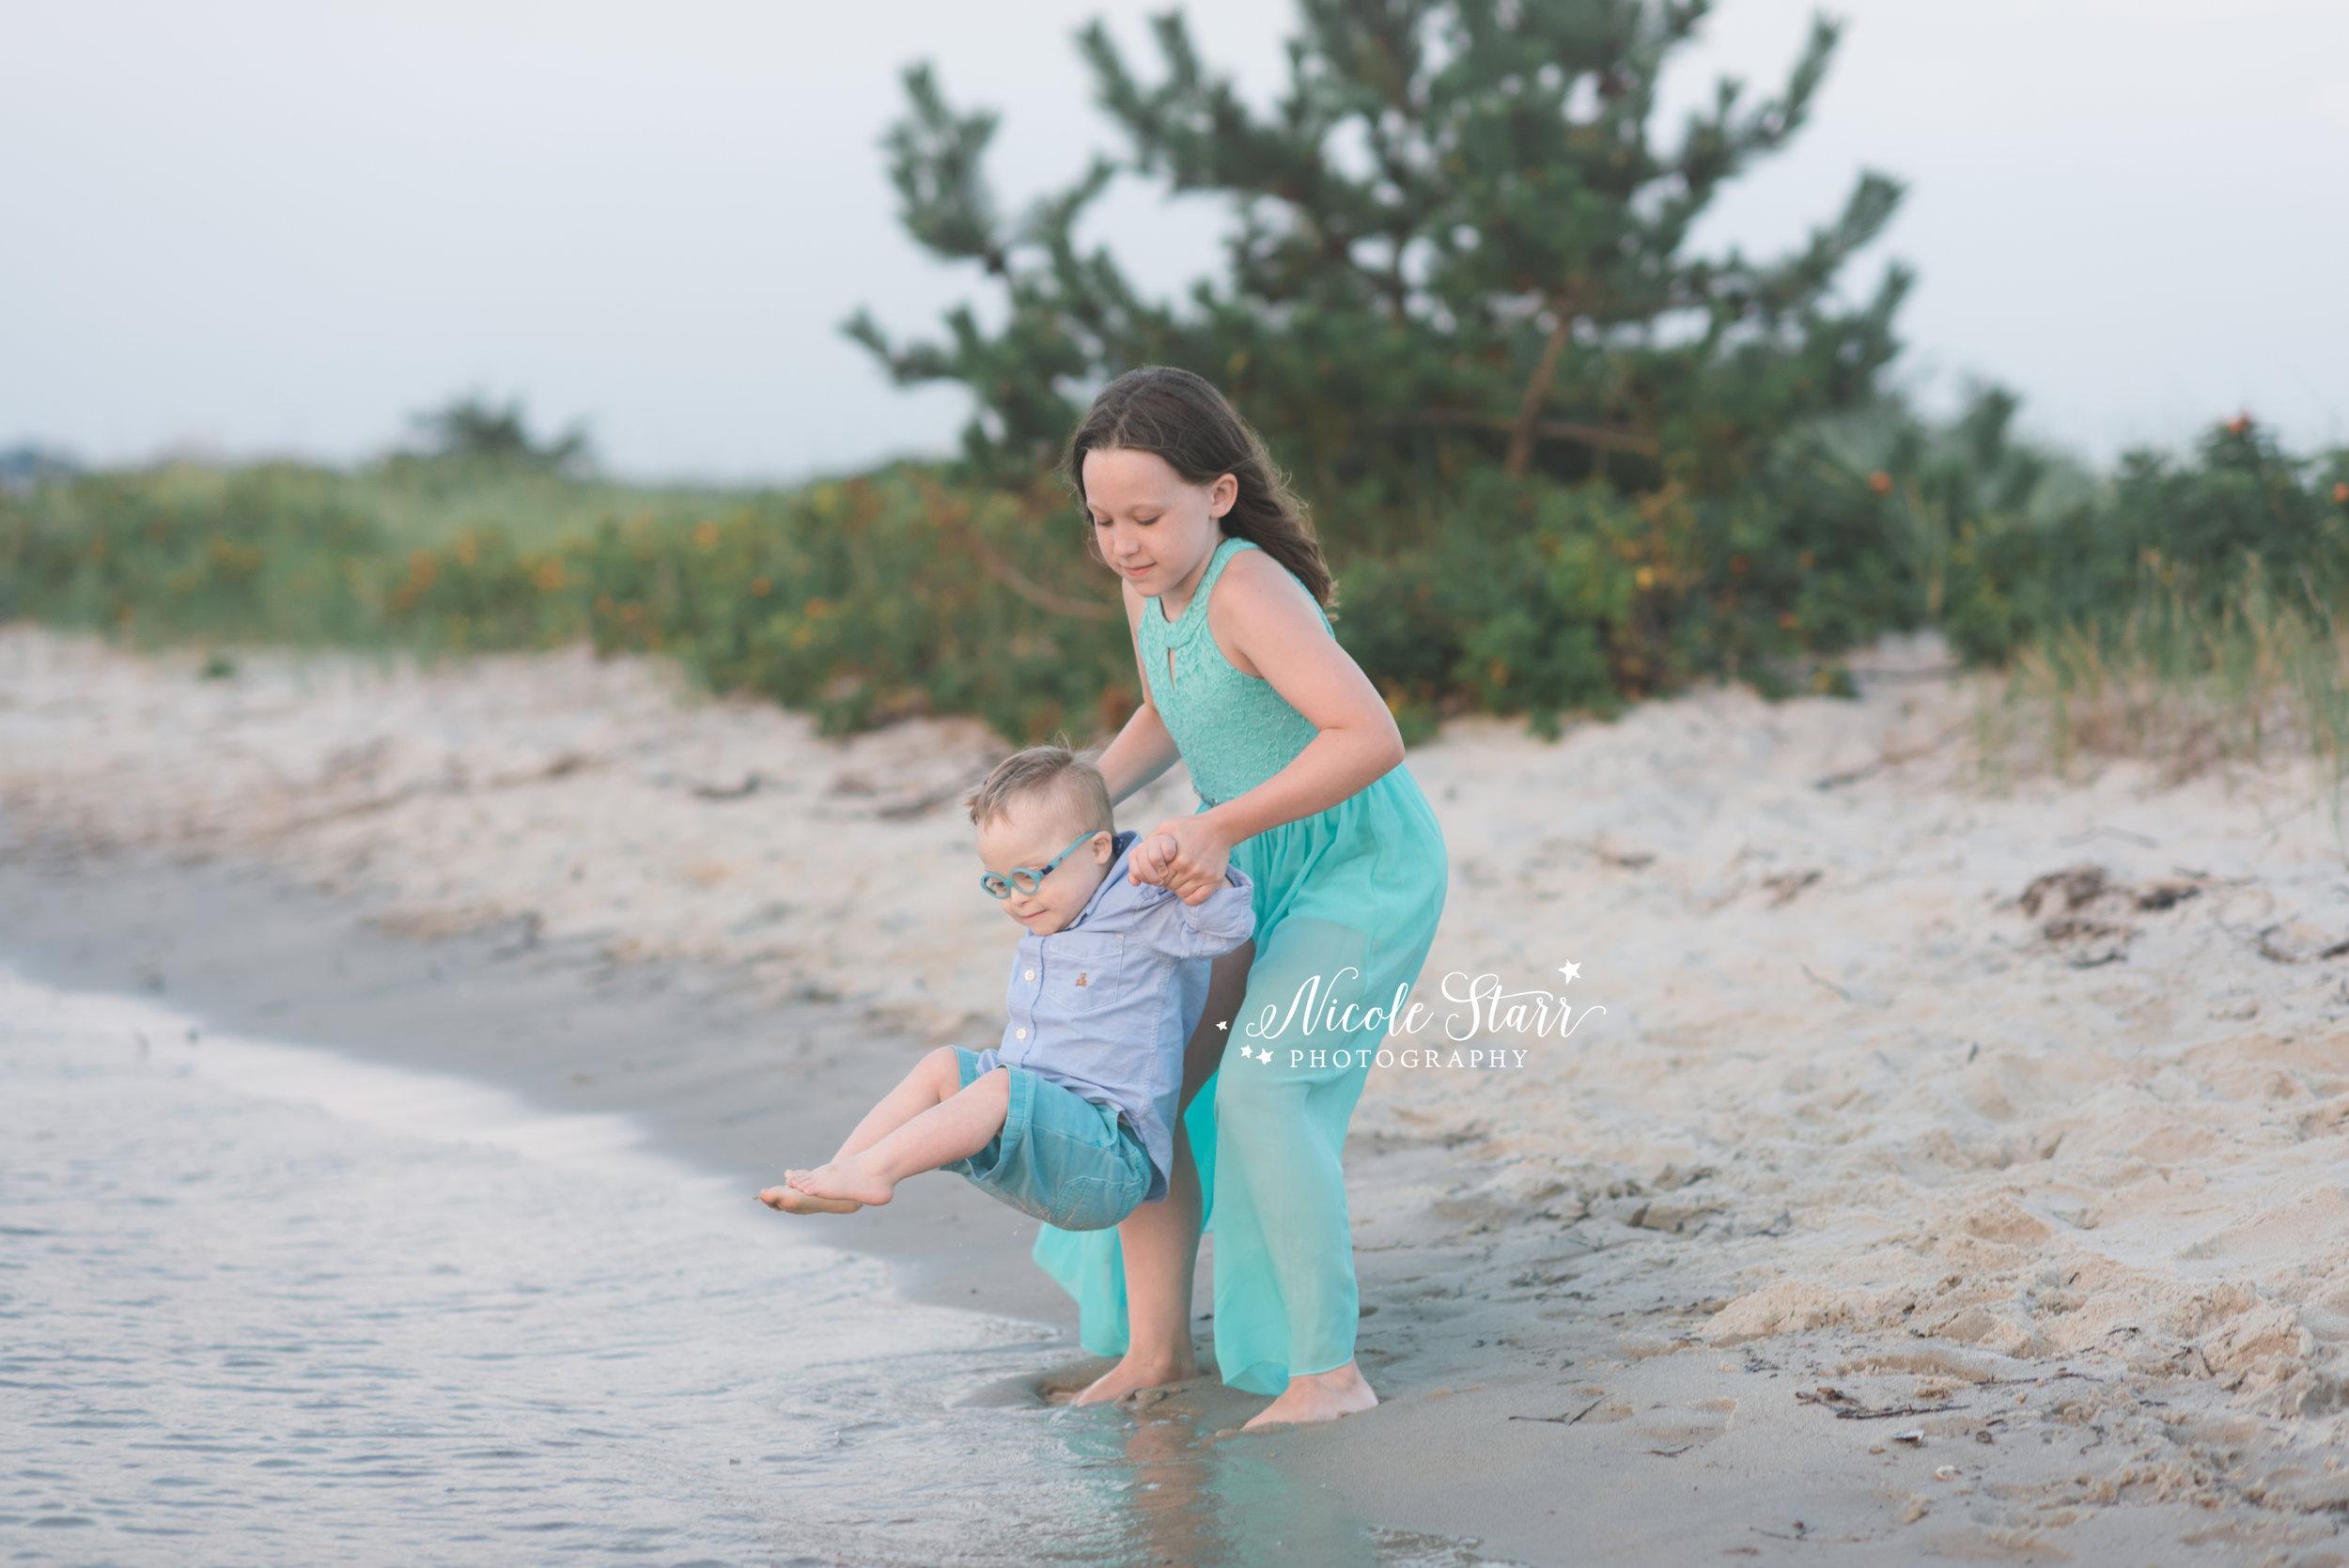 Nicole Starr Photography   Cape Cod Family Photographer   Boston Family Photographer   Family Photographer   Beach Family Photographer   Massachusetts Family Photographer